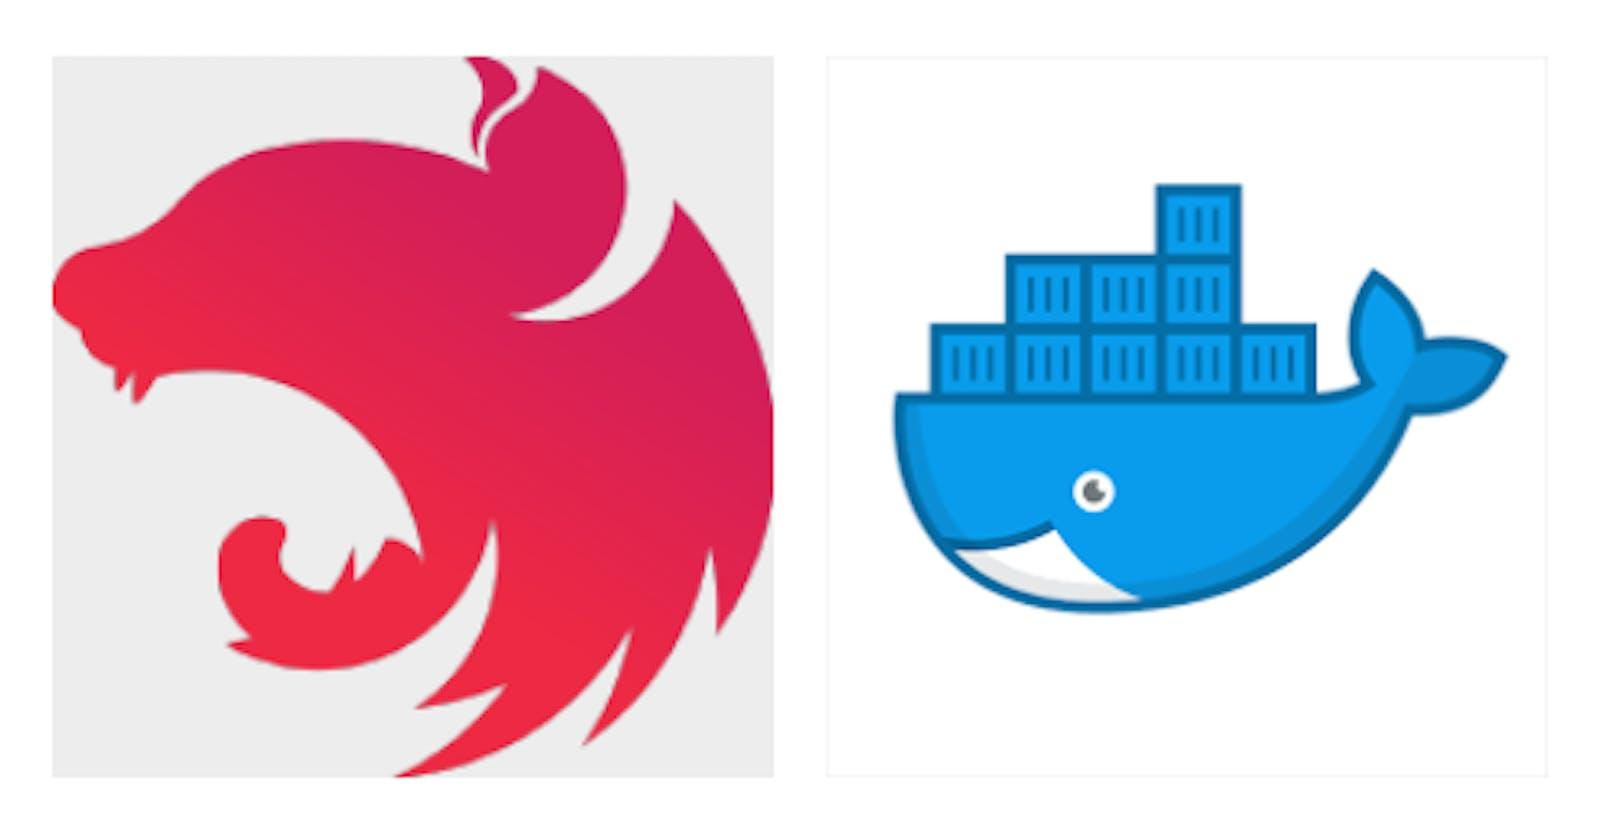 Dockerizing NestJs application for production